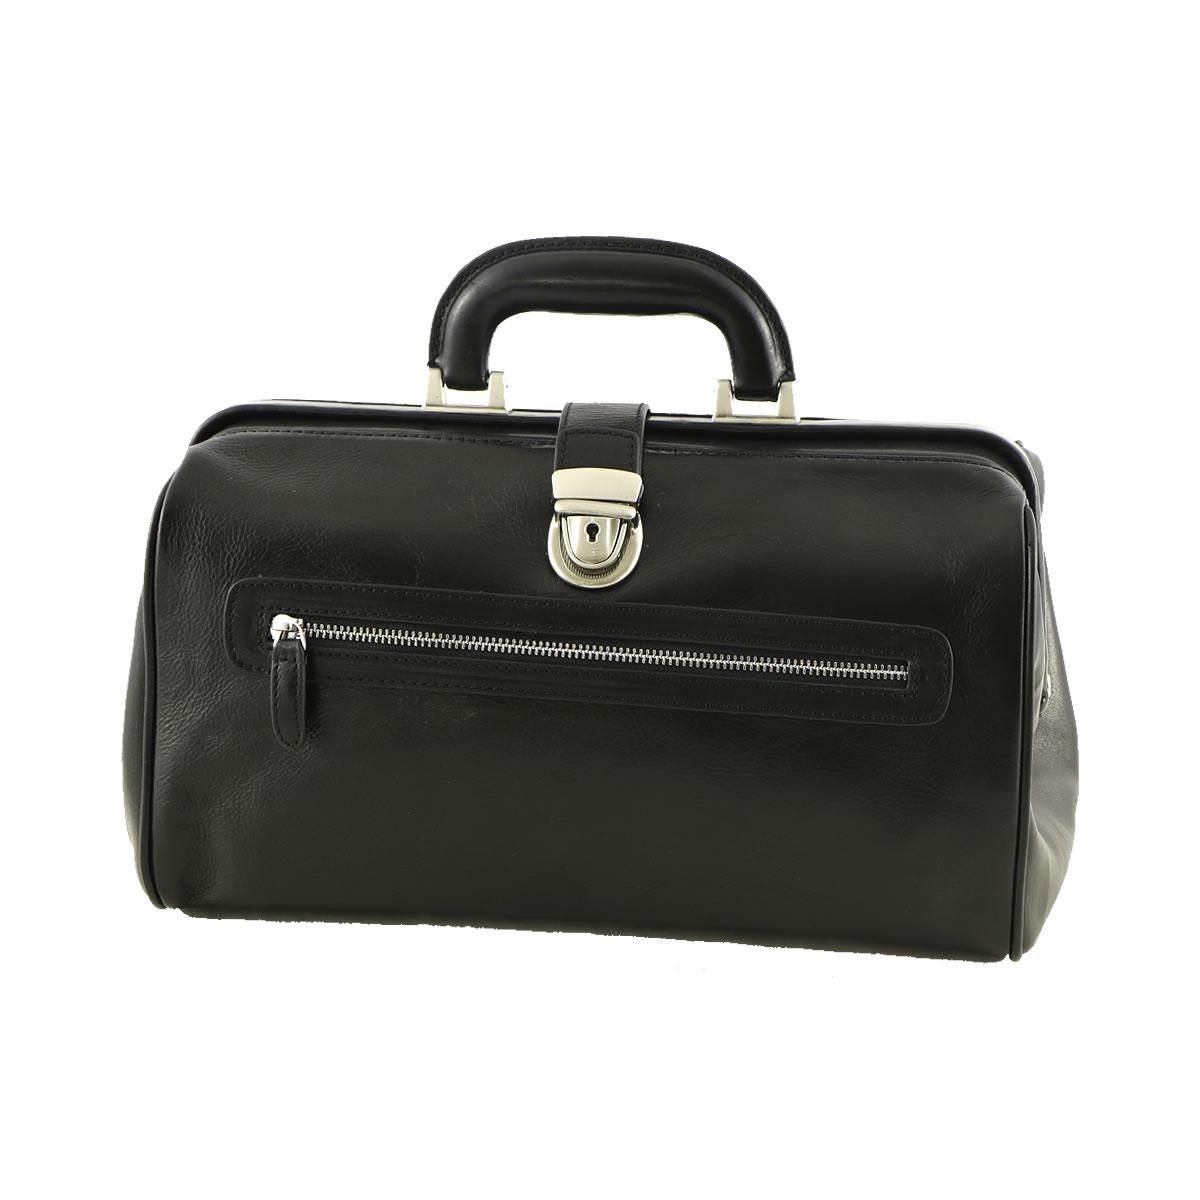 Doctor-working-bag-black